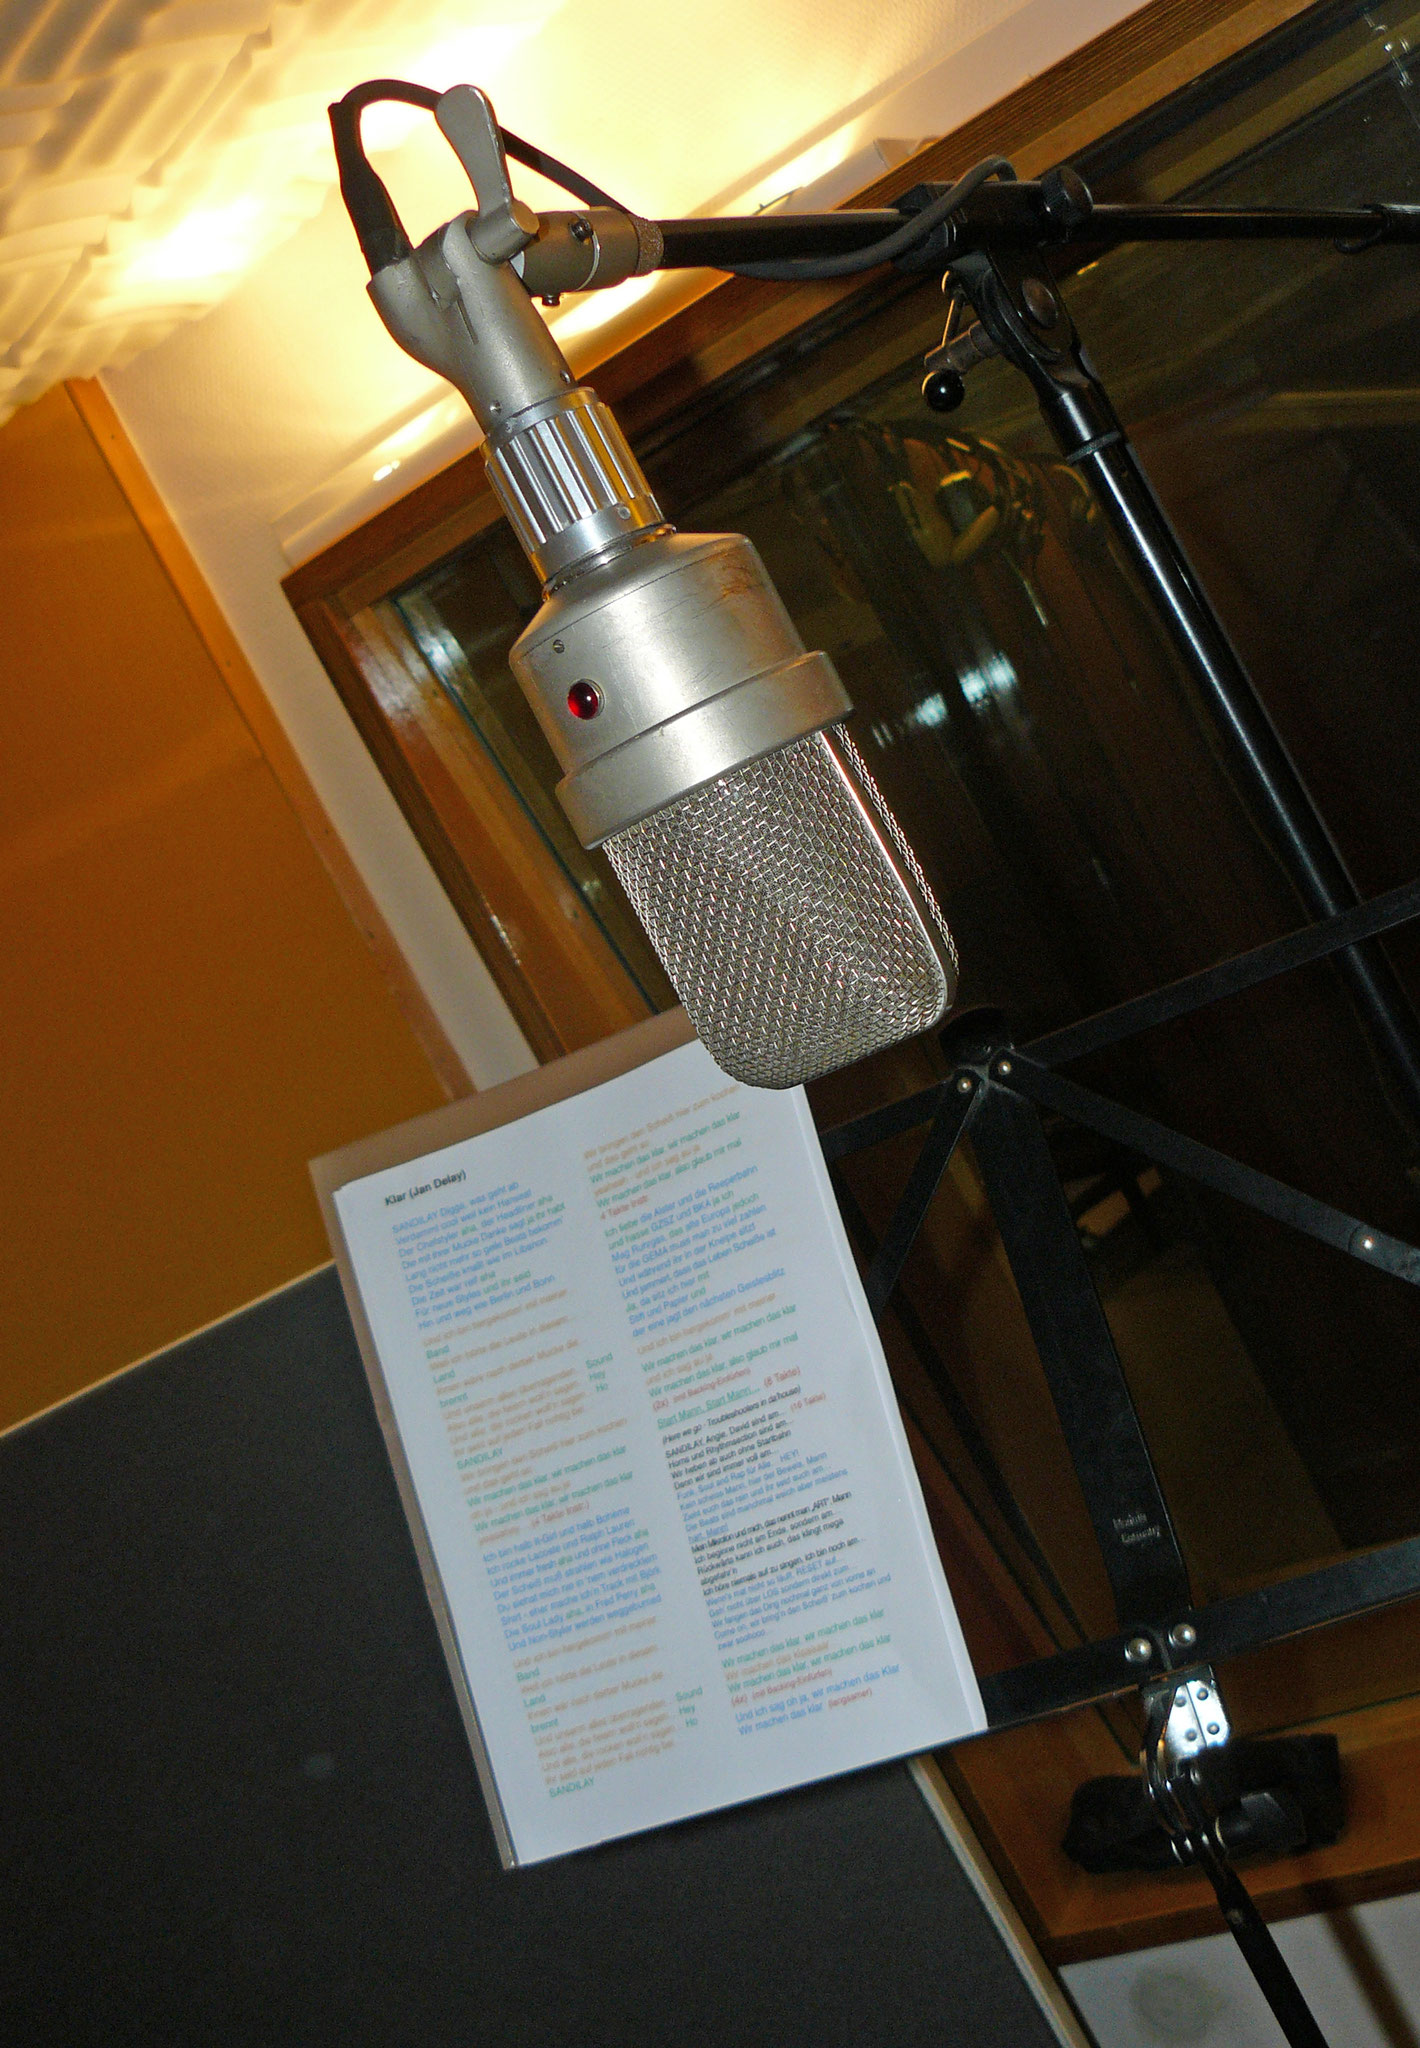 geballte Vocalpower bei den Troubleshooters